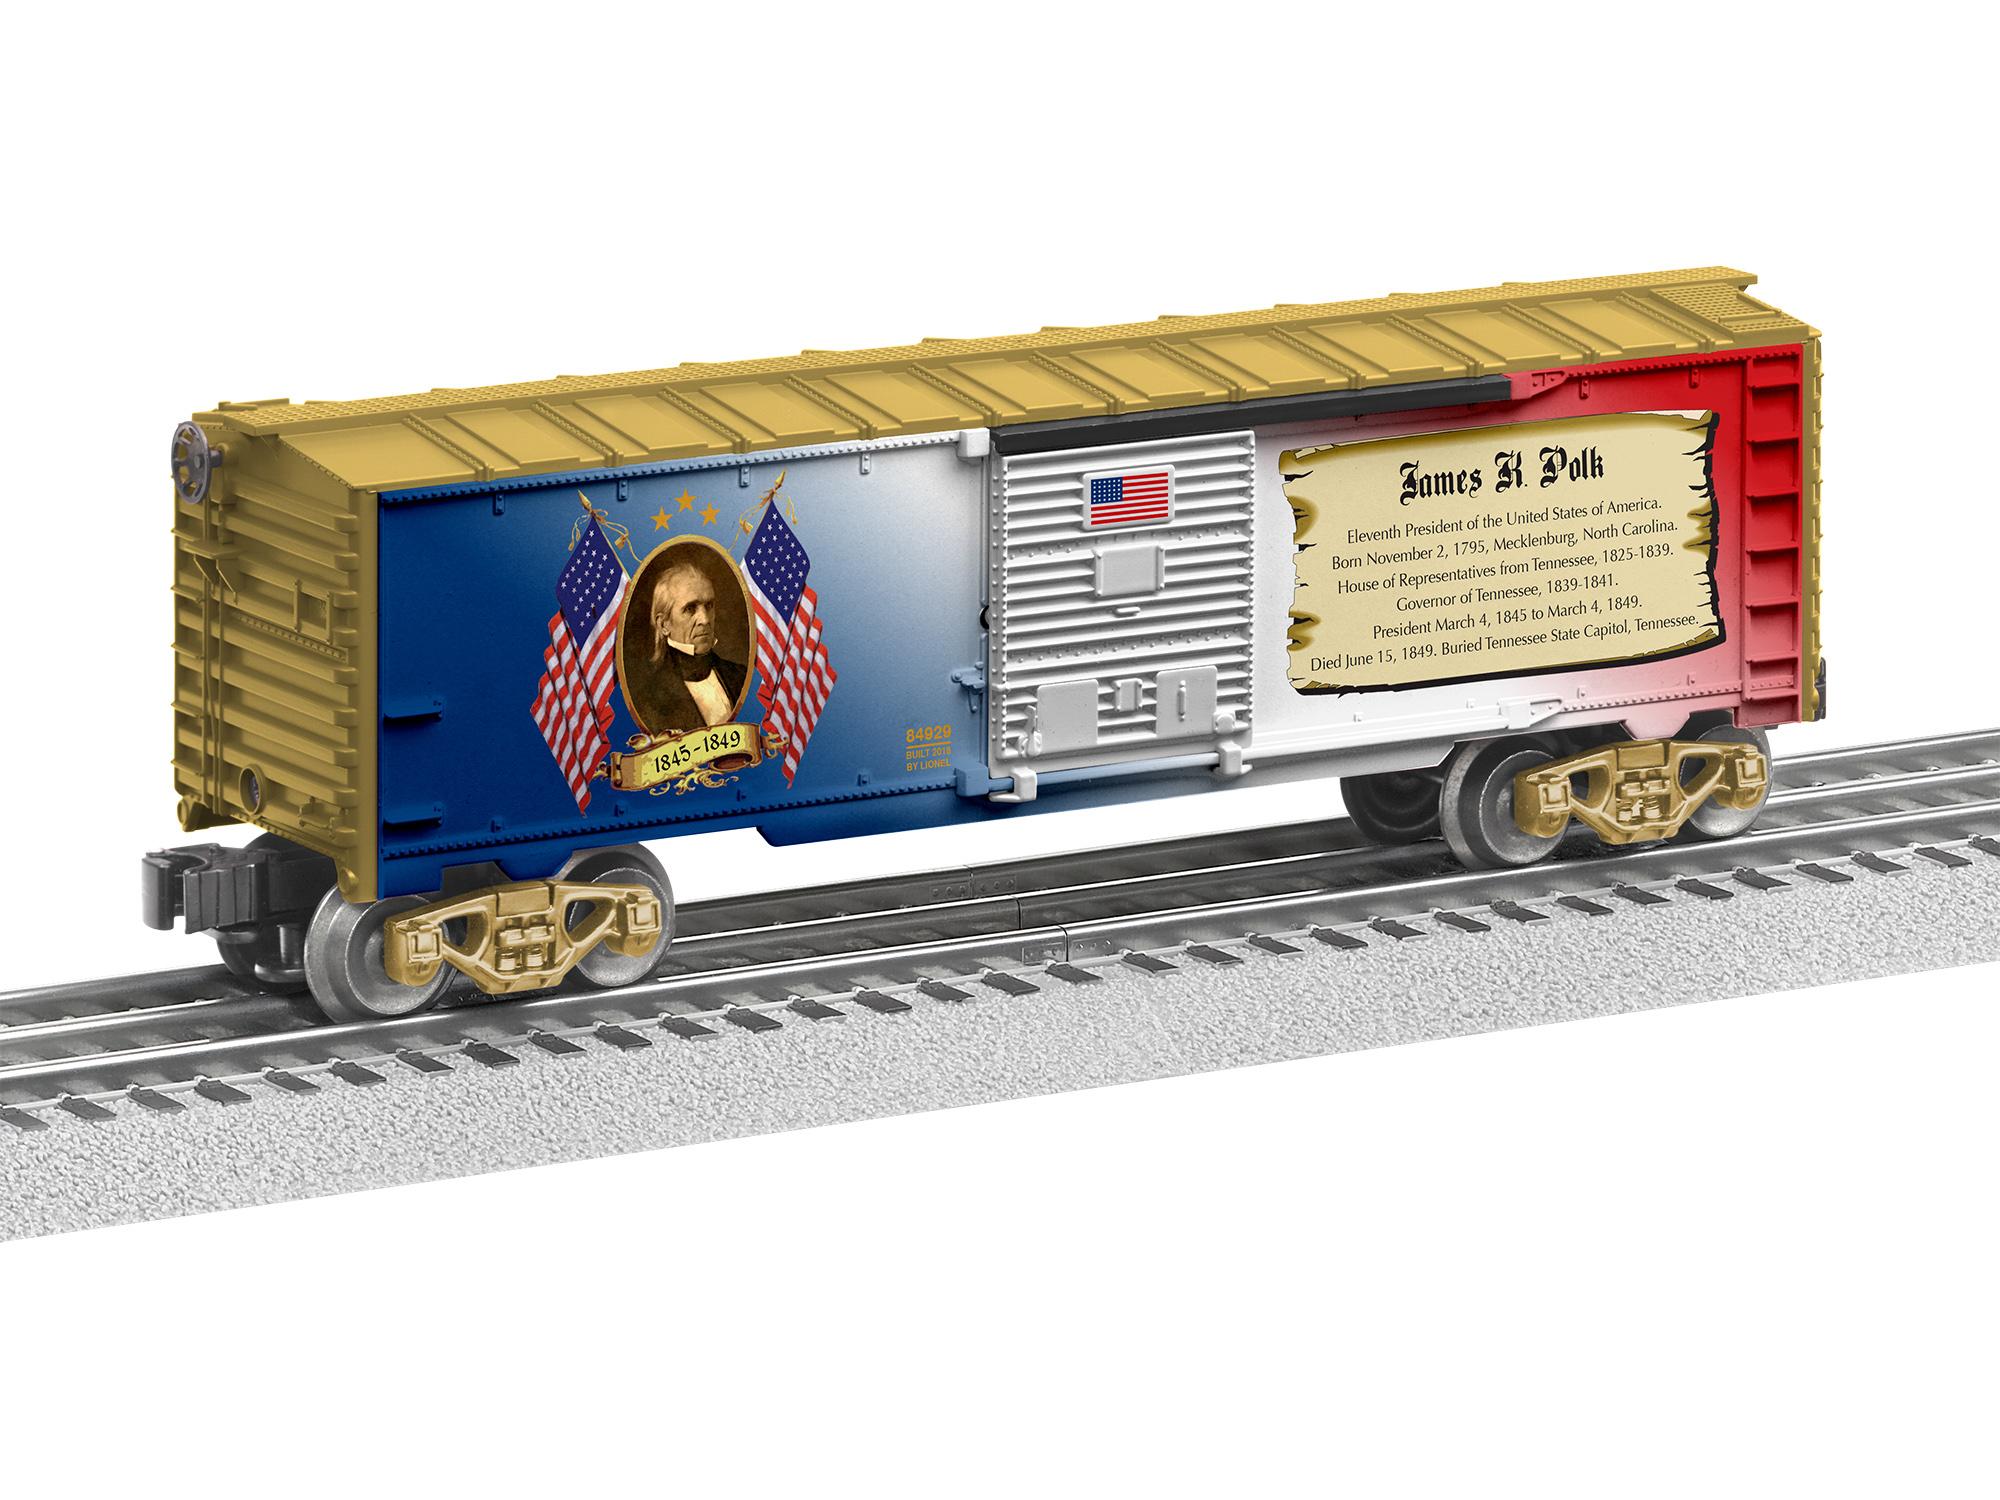 LNL684929 Lionel O-27 Box, James K. Polk